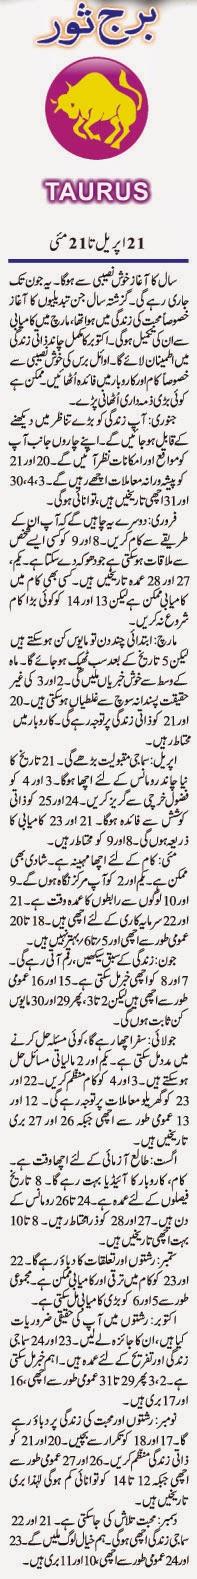 2002 Ford Taurus In Urdu   Upcomingcarshq.com